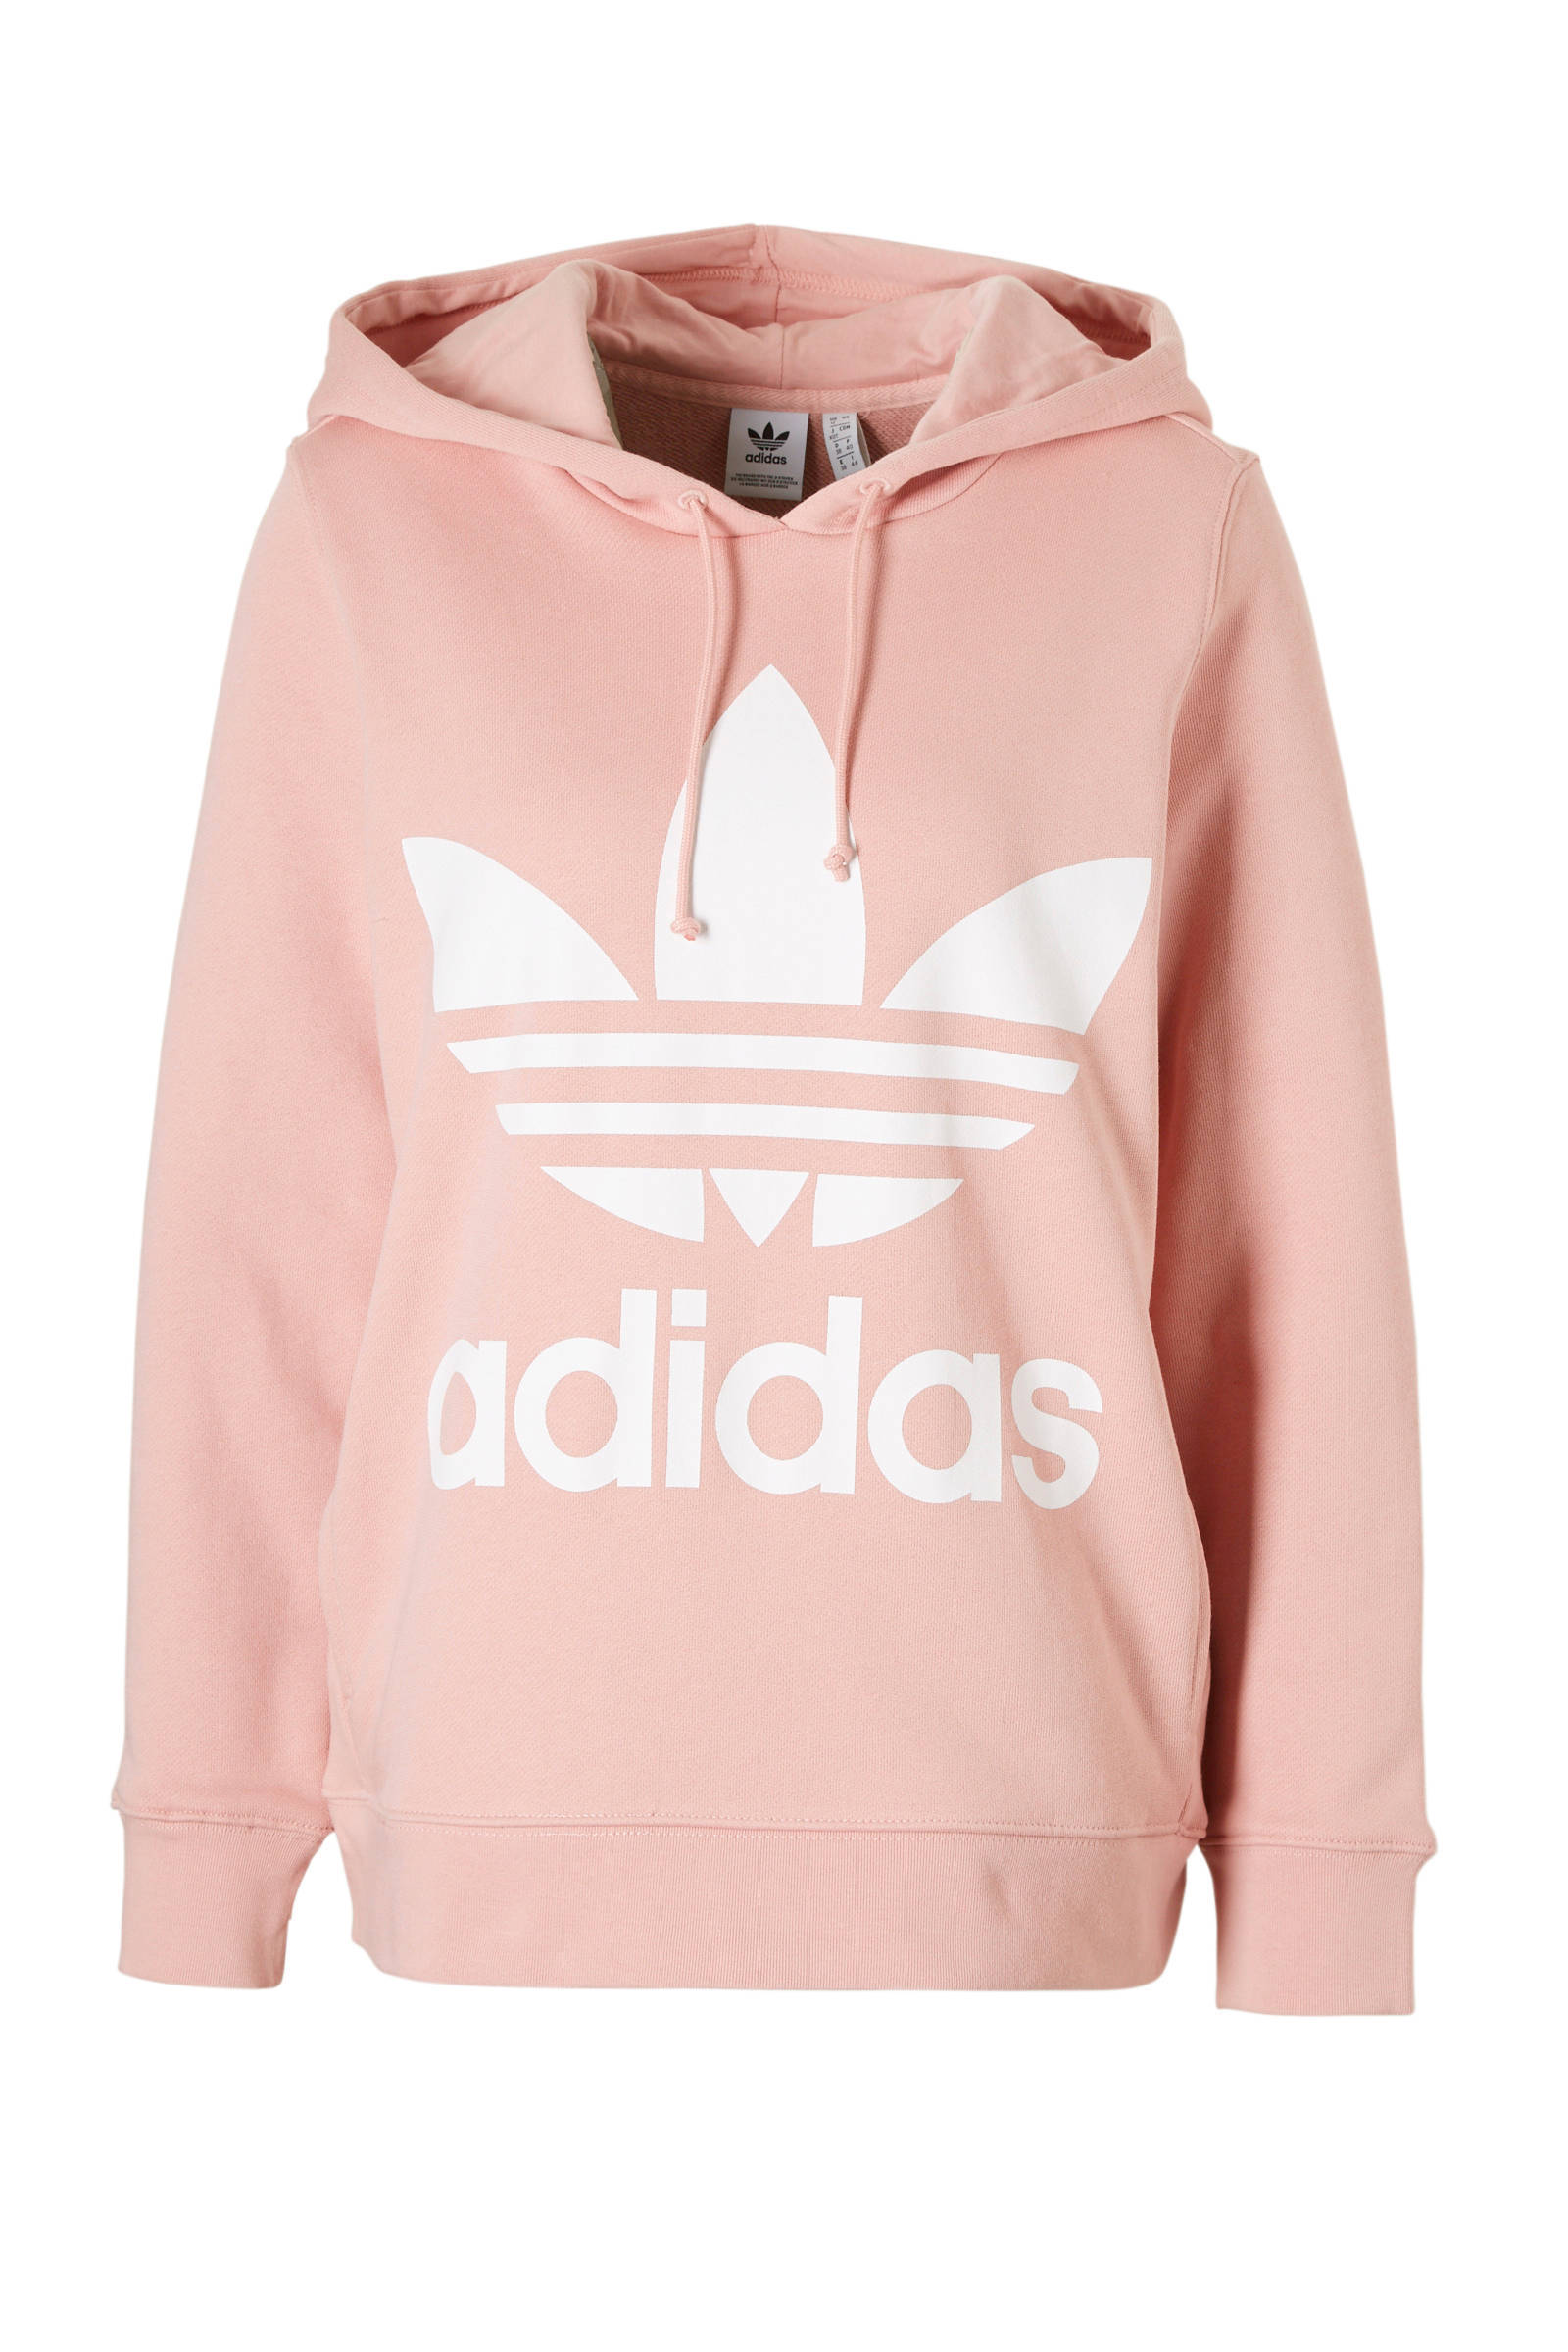 Adidas Originals Trefoil Overhead Hoodie Dames Roze Dames ...